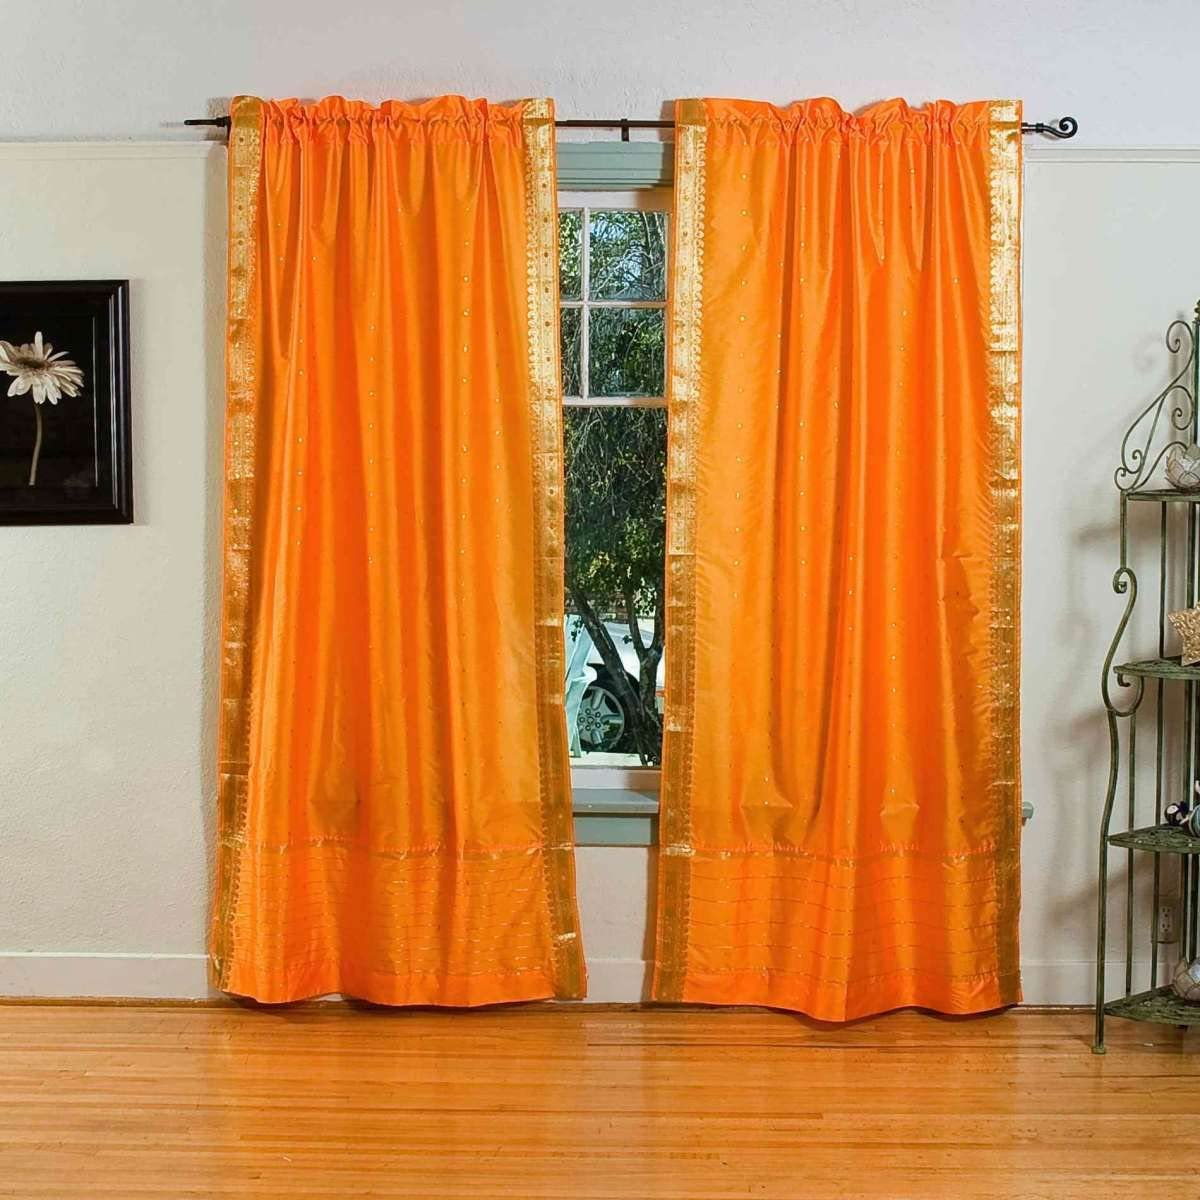 Lined-Pumpkin 84-inch Rod Pocket Sheer Sari Curtain Panel India – Piece